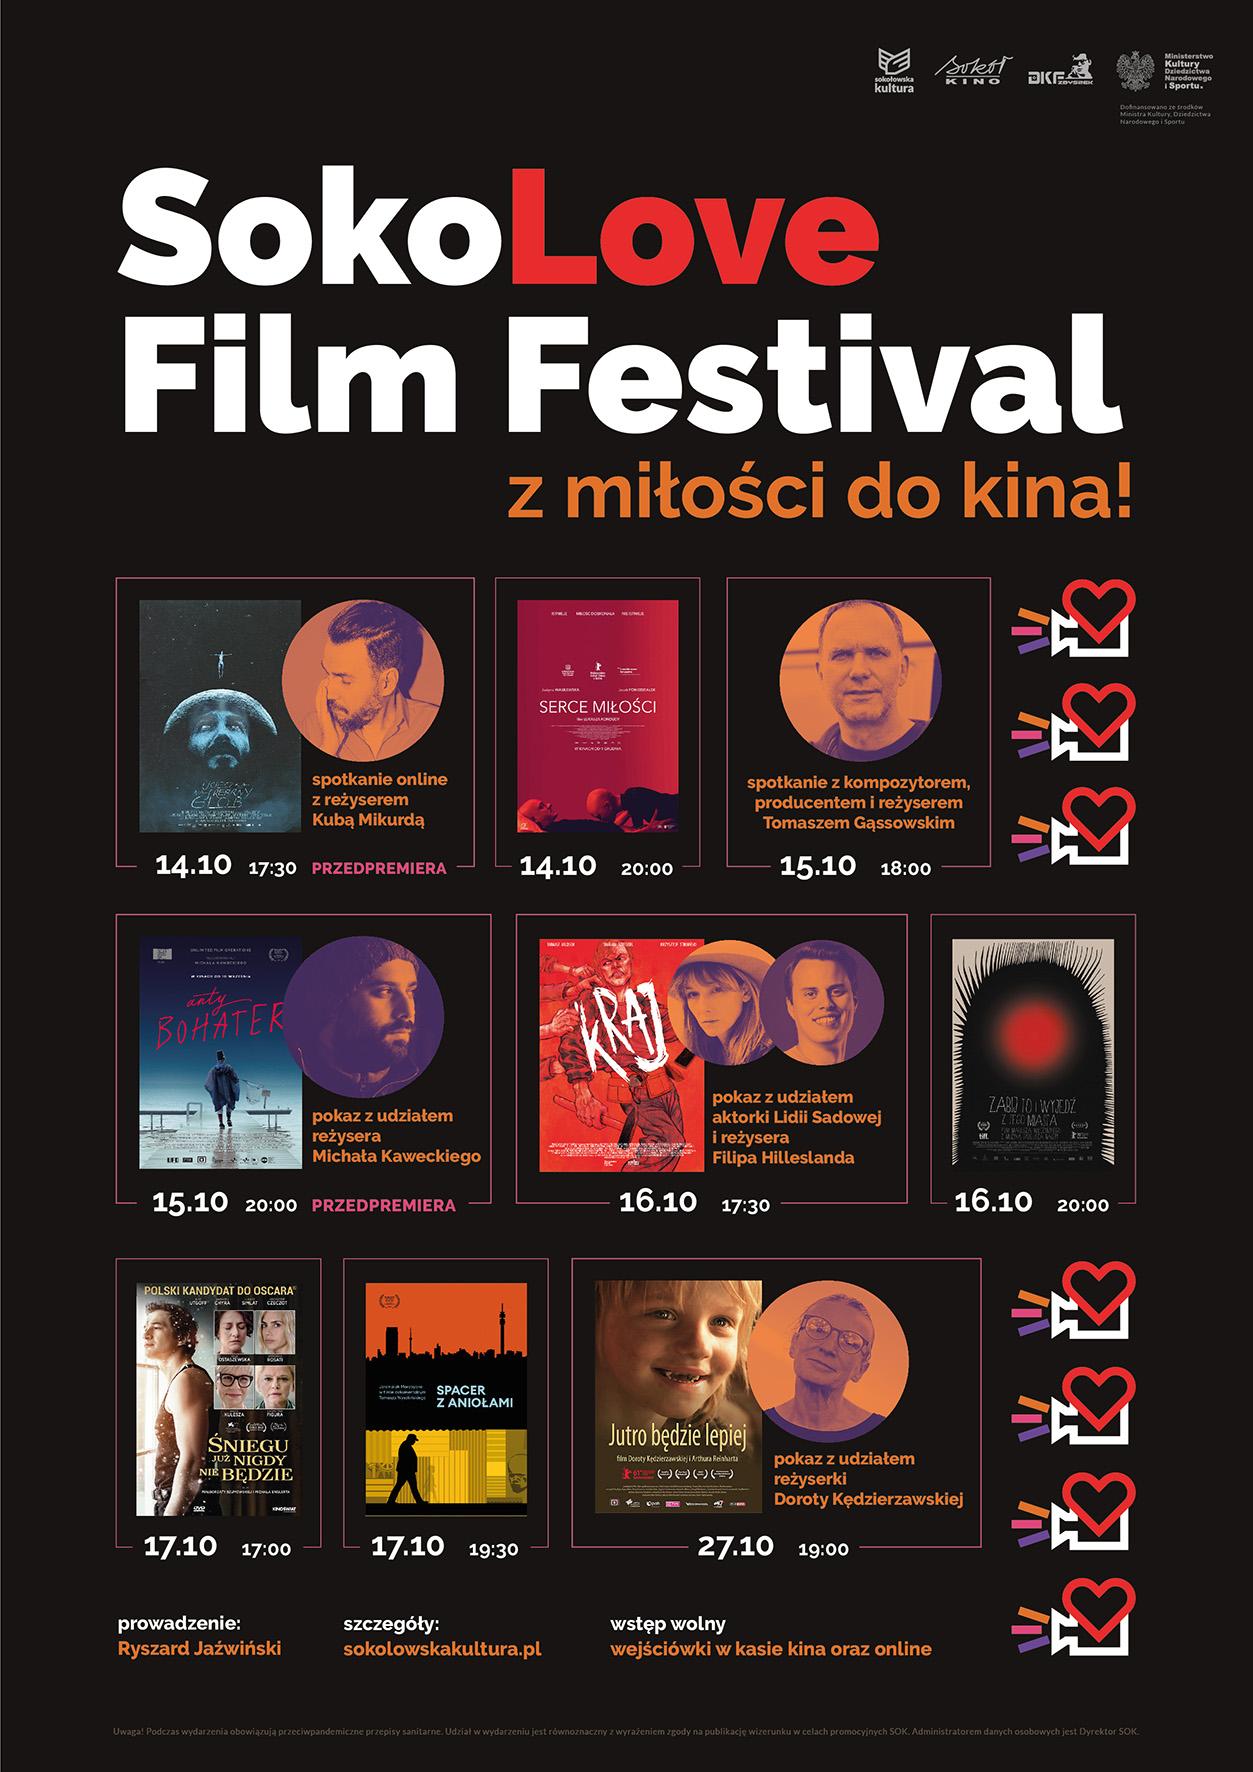 foto:  - sokolove2021 filmy